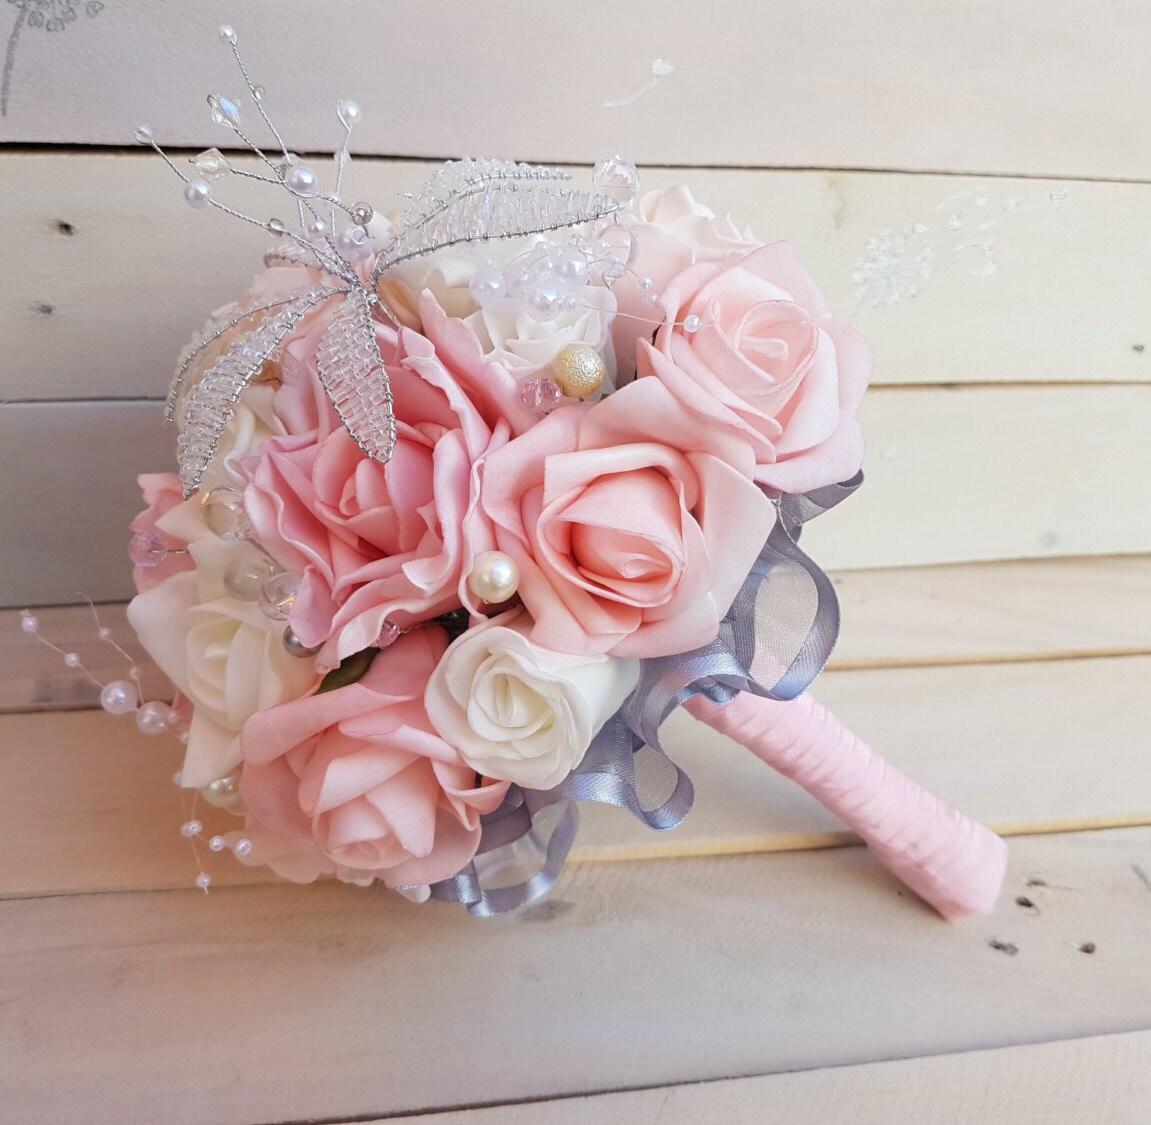 Sale Wedding brooch bouquet brooch button bouquet bride